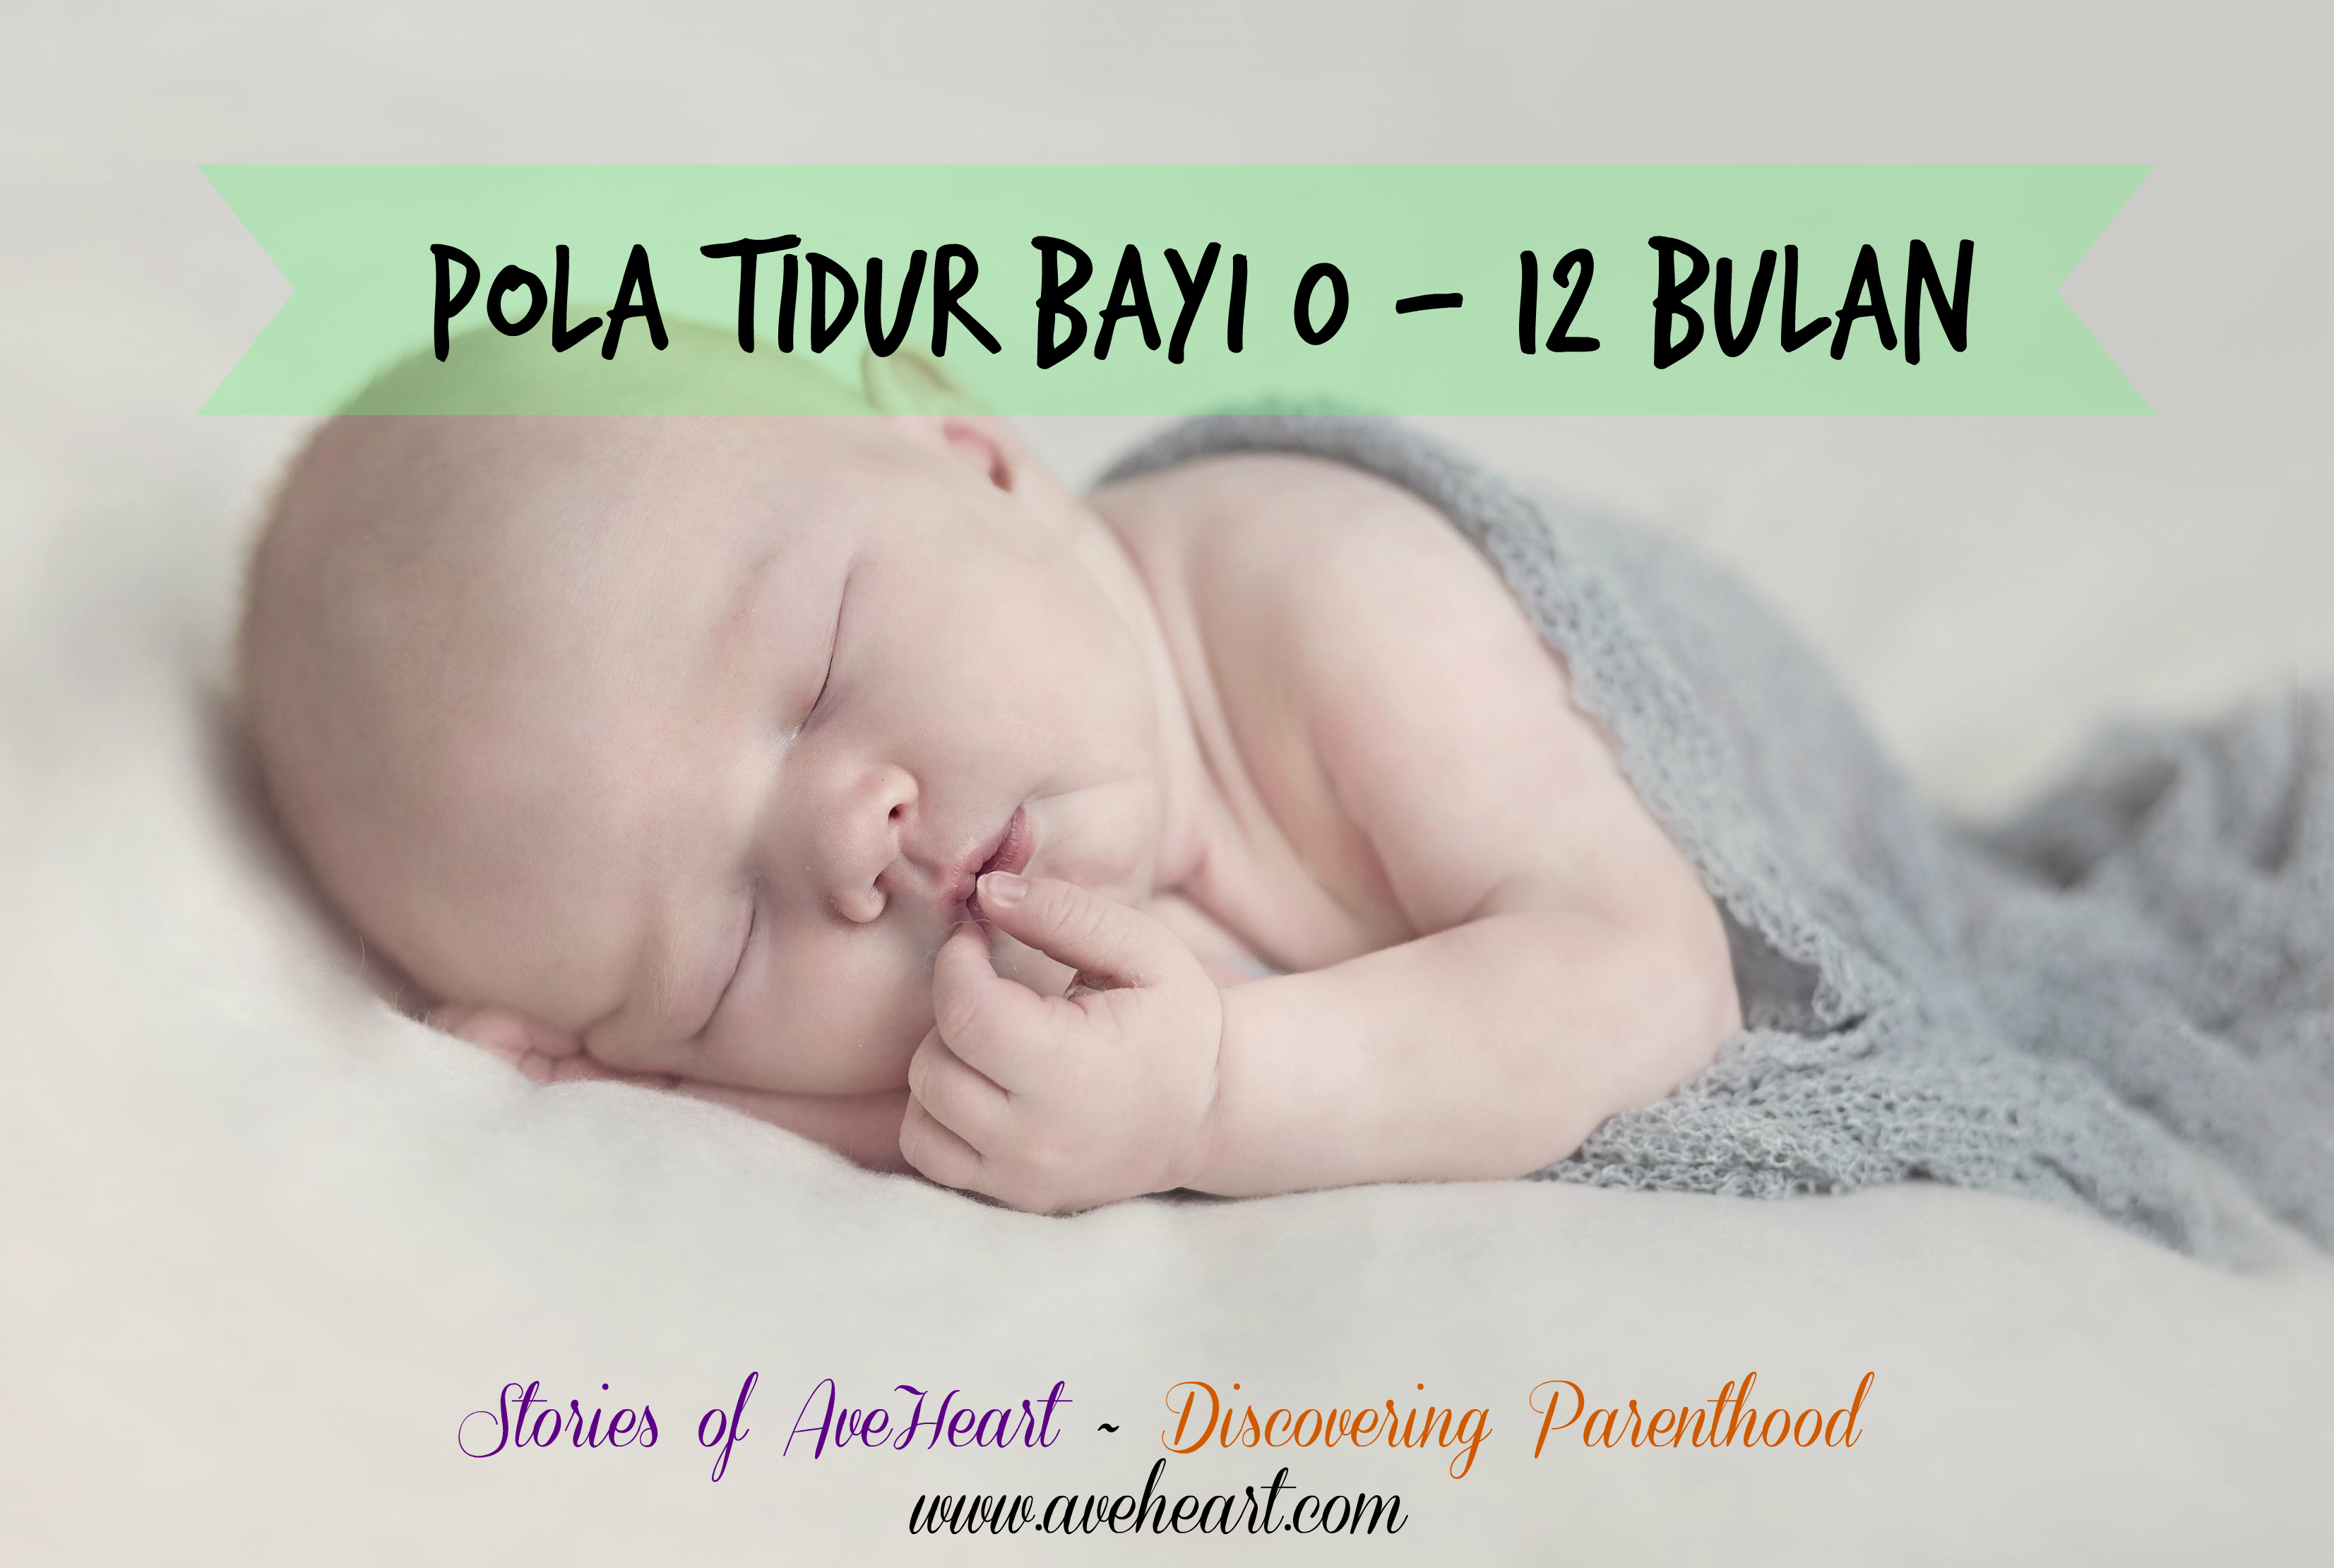 Pola Tidur Bayi 0 - 12 Bulan